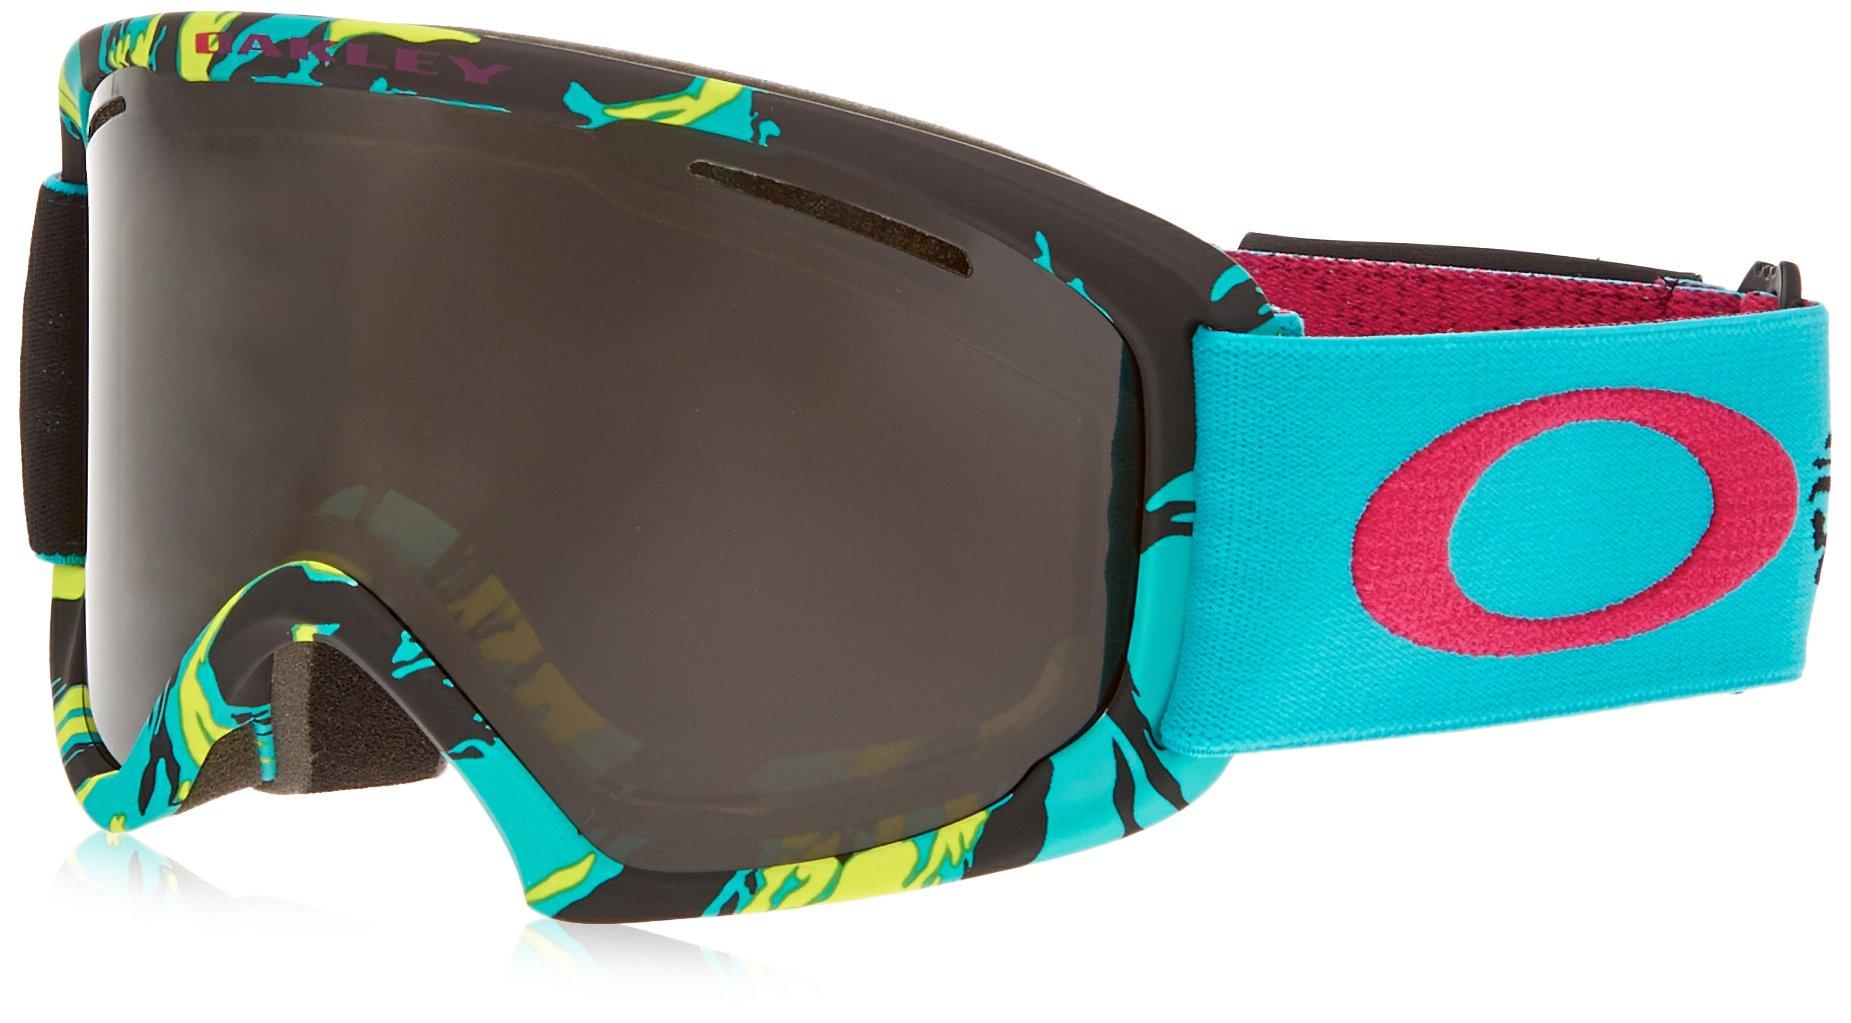 Oakley OO7045-10 O2 XL Eyewear, Neon Camo, Dark Grey Lens by Oakley